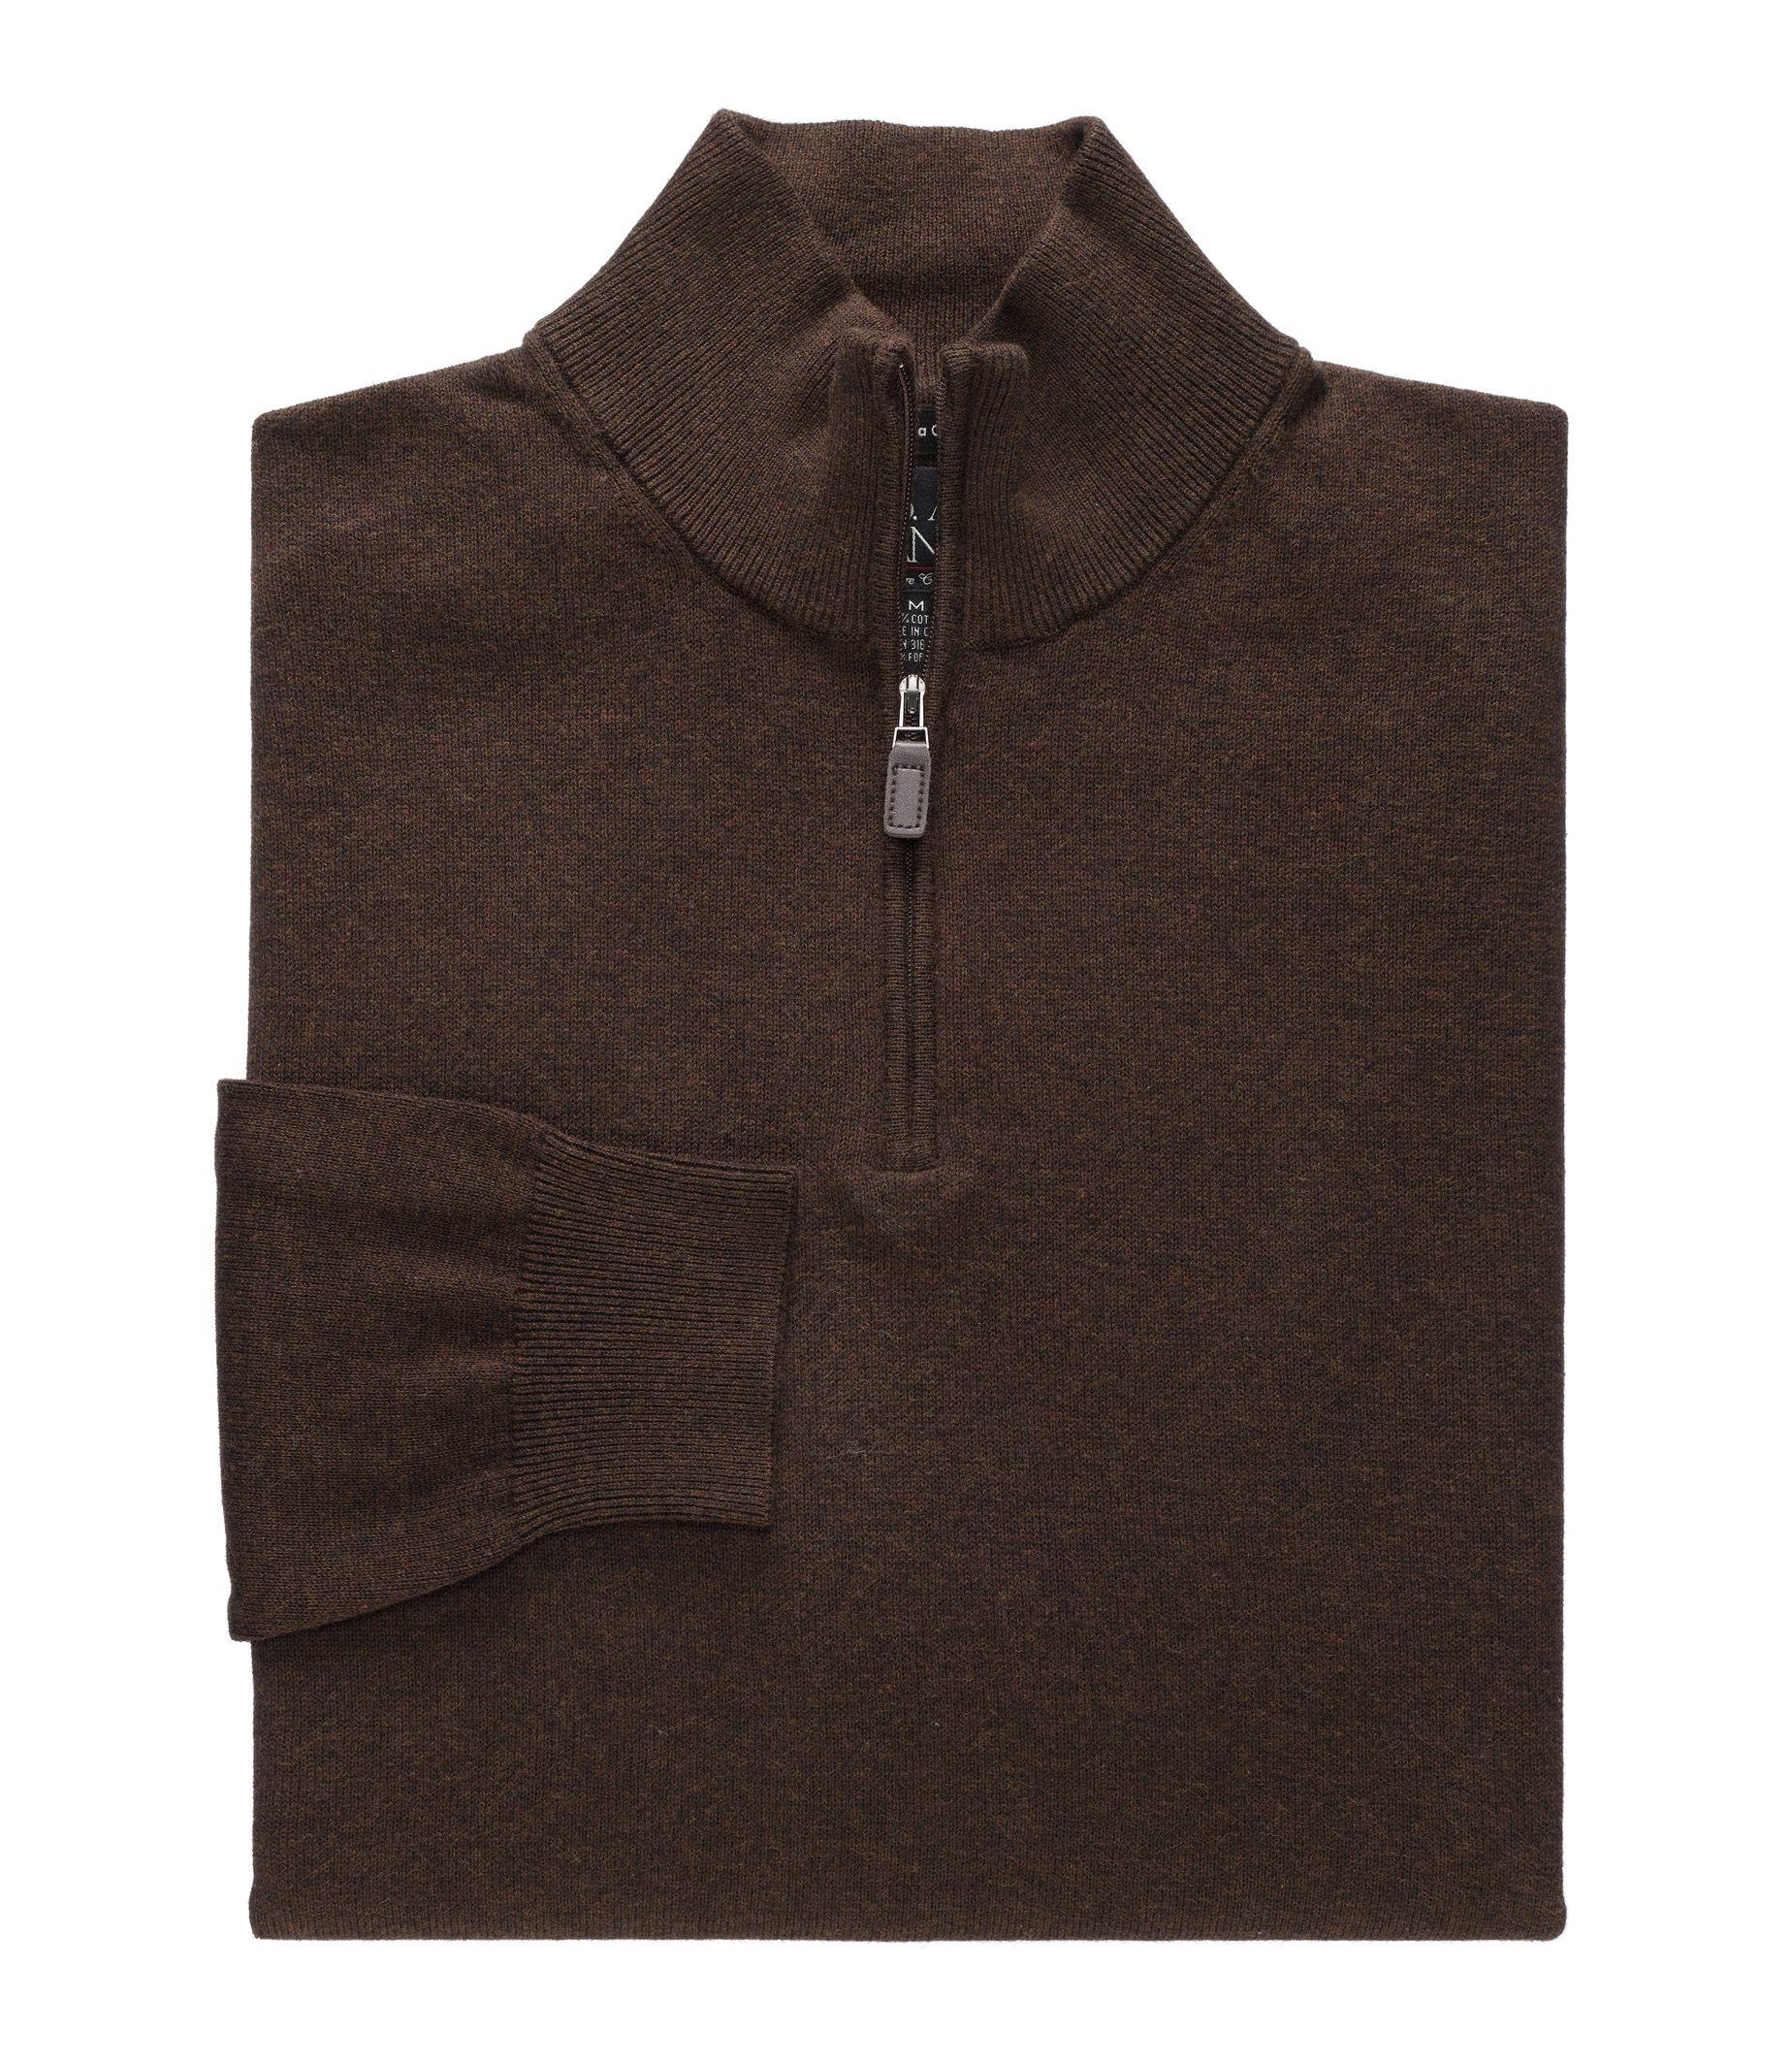 joseph a banks mens sweaters